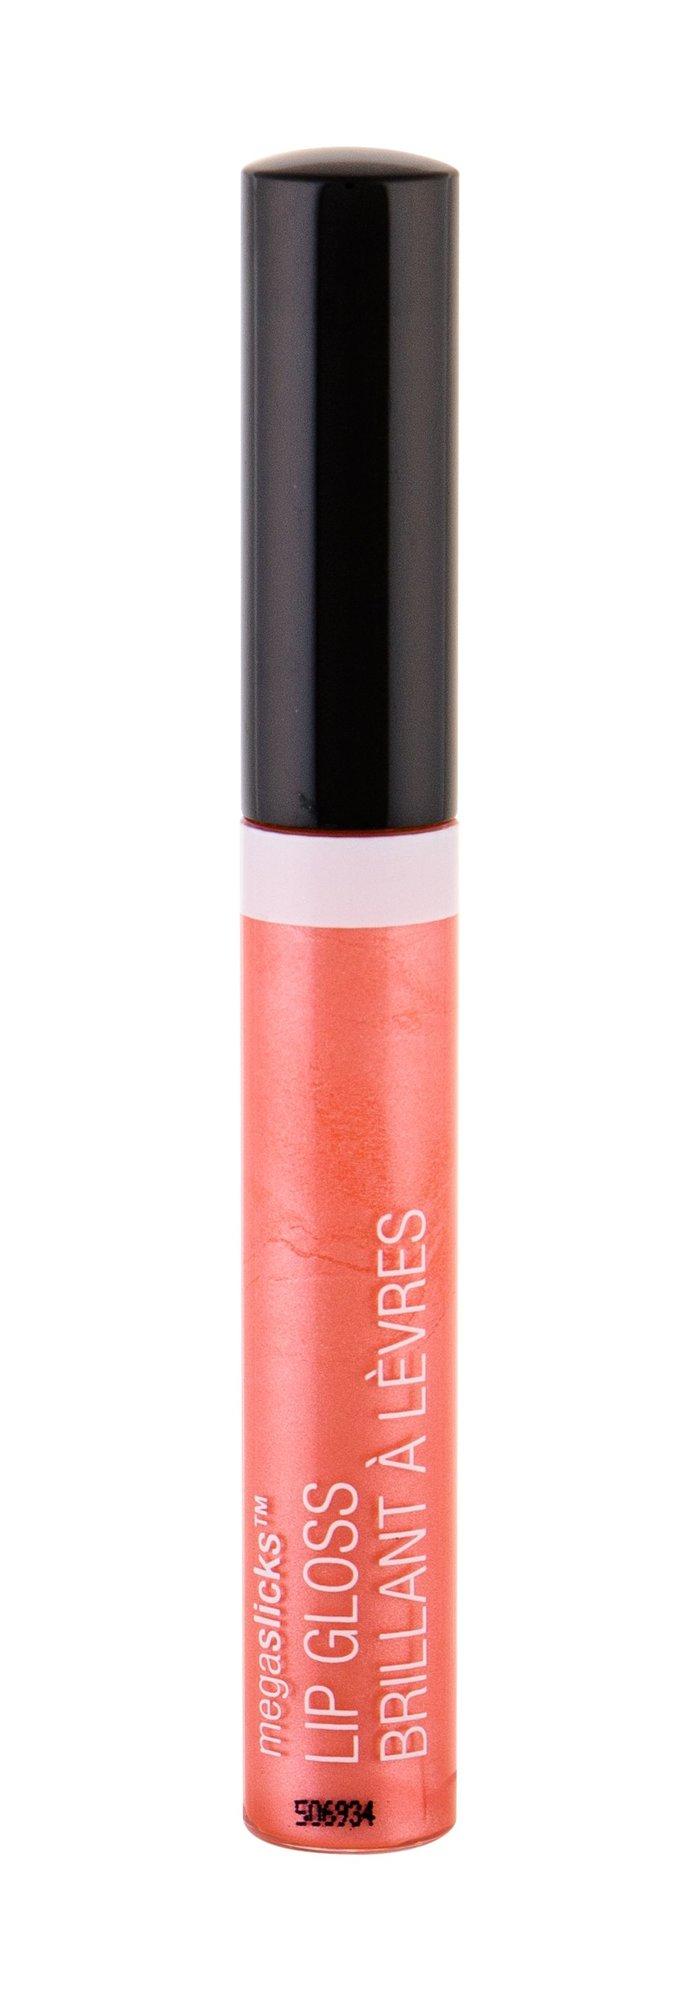 Wet n Wild MegaSlicks Lip Gloss 5,4ml Strawberry Ice